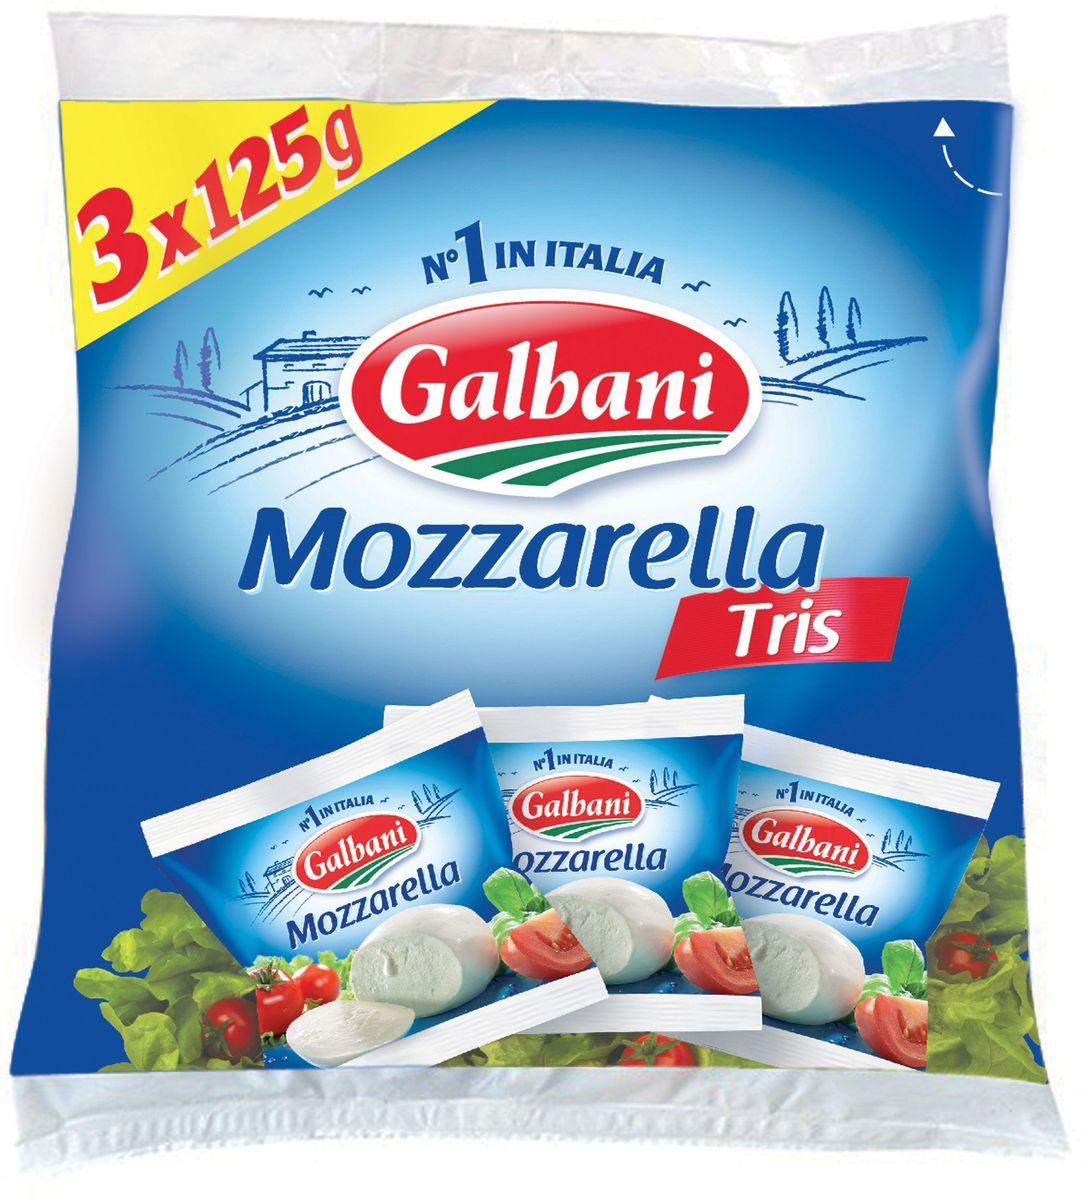 Galbani Сыр Моцарелла Трио 45%, 3 шт по 125 г galbani сыр маскарпоне 80% 250 г